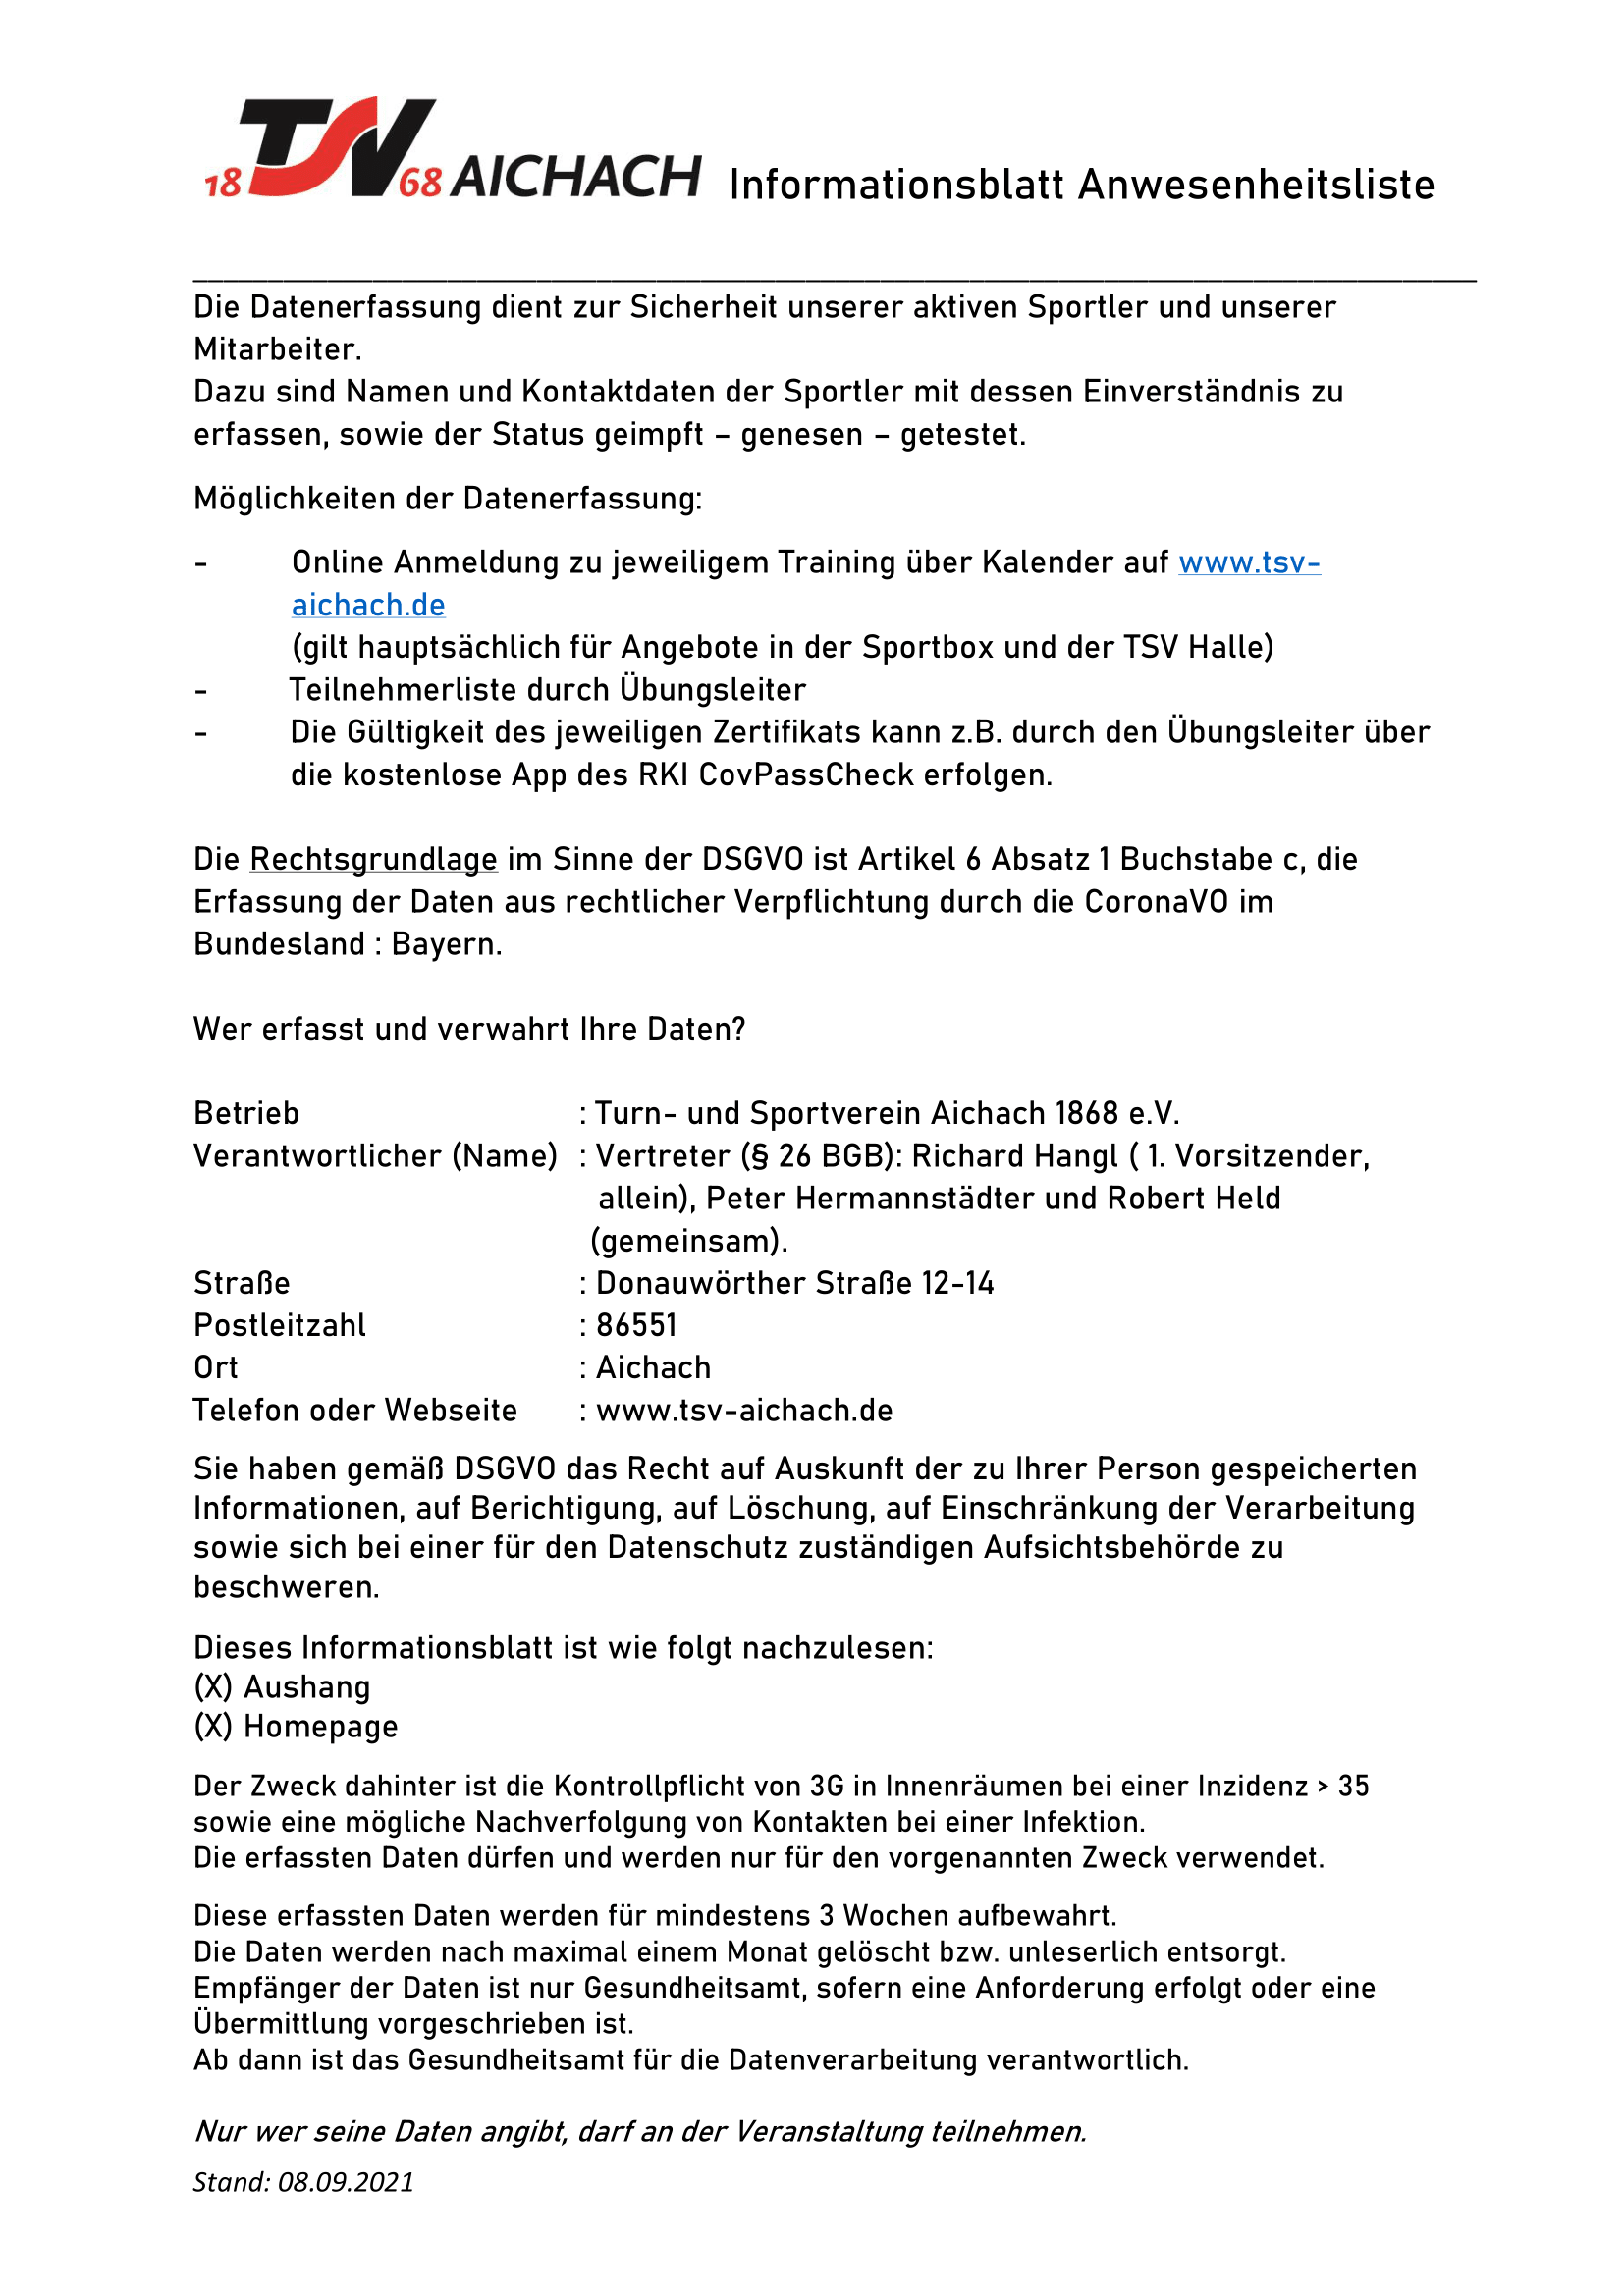 Informationsblatt_Anwesenheitsliste-1